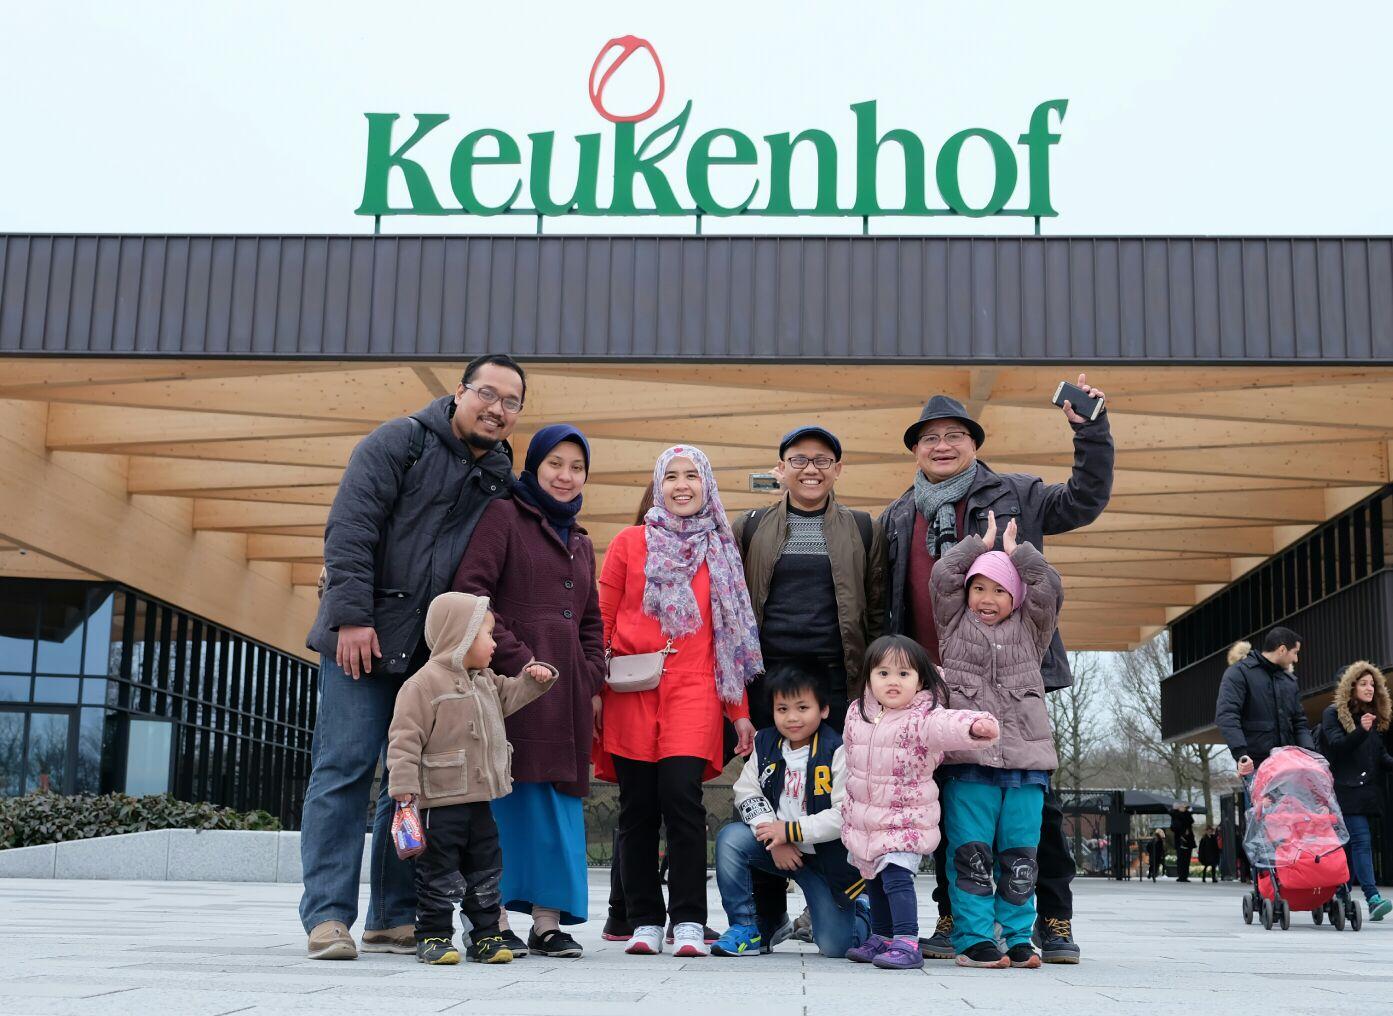 Keukenhof, Taman Tulip, Belanda, Taman Bunga, Wisata Taman Bunga, Serbalanda Tour, Tour Belanda